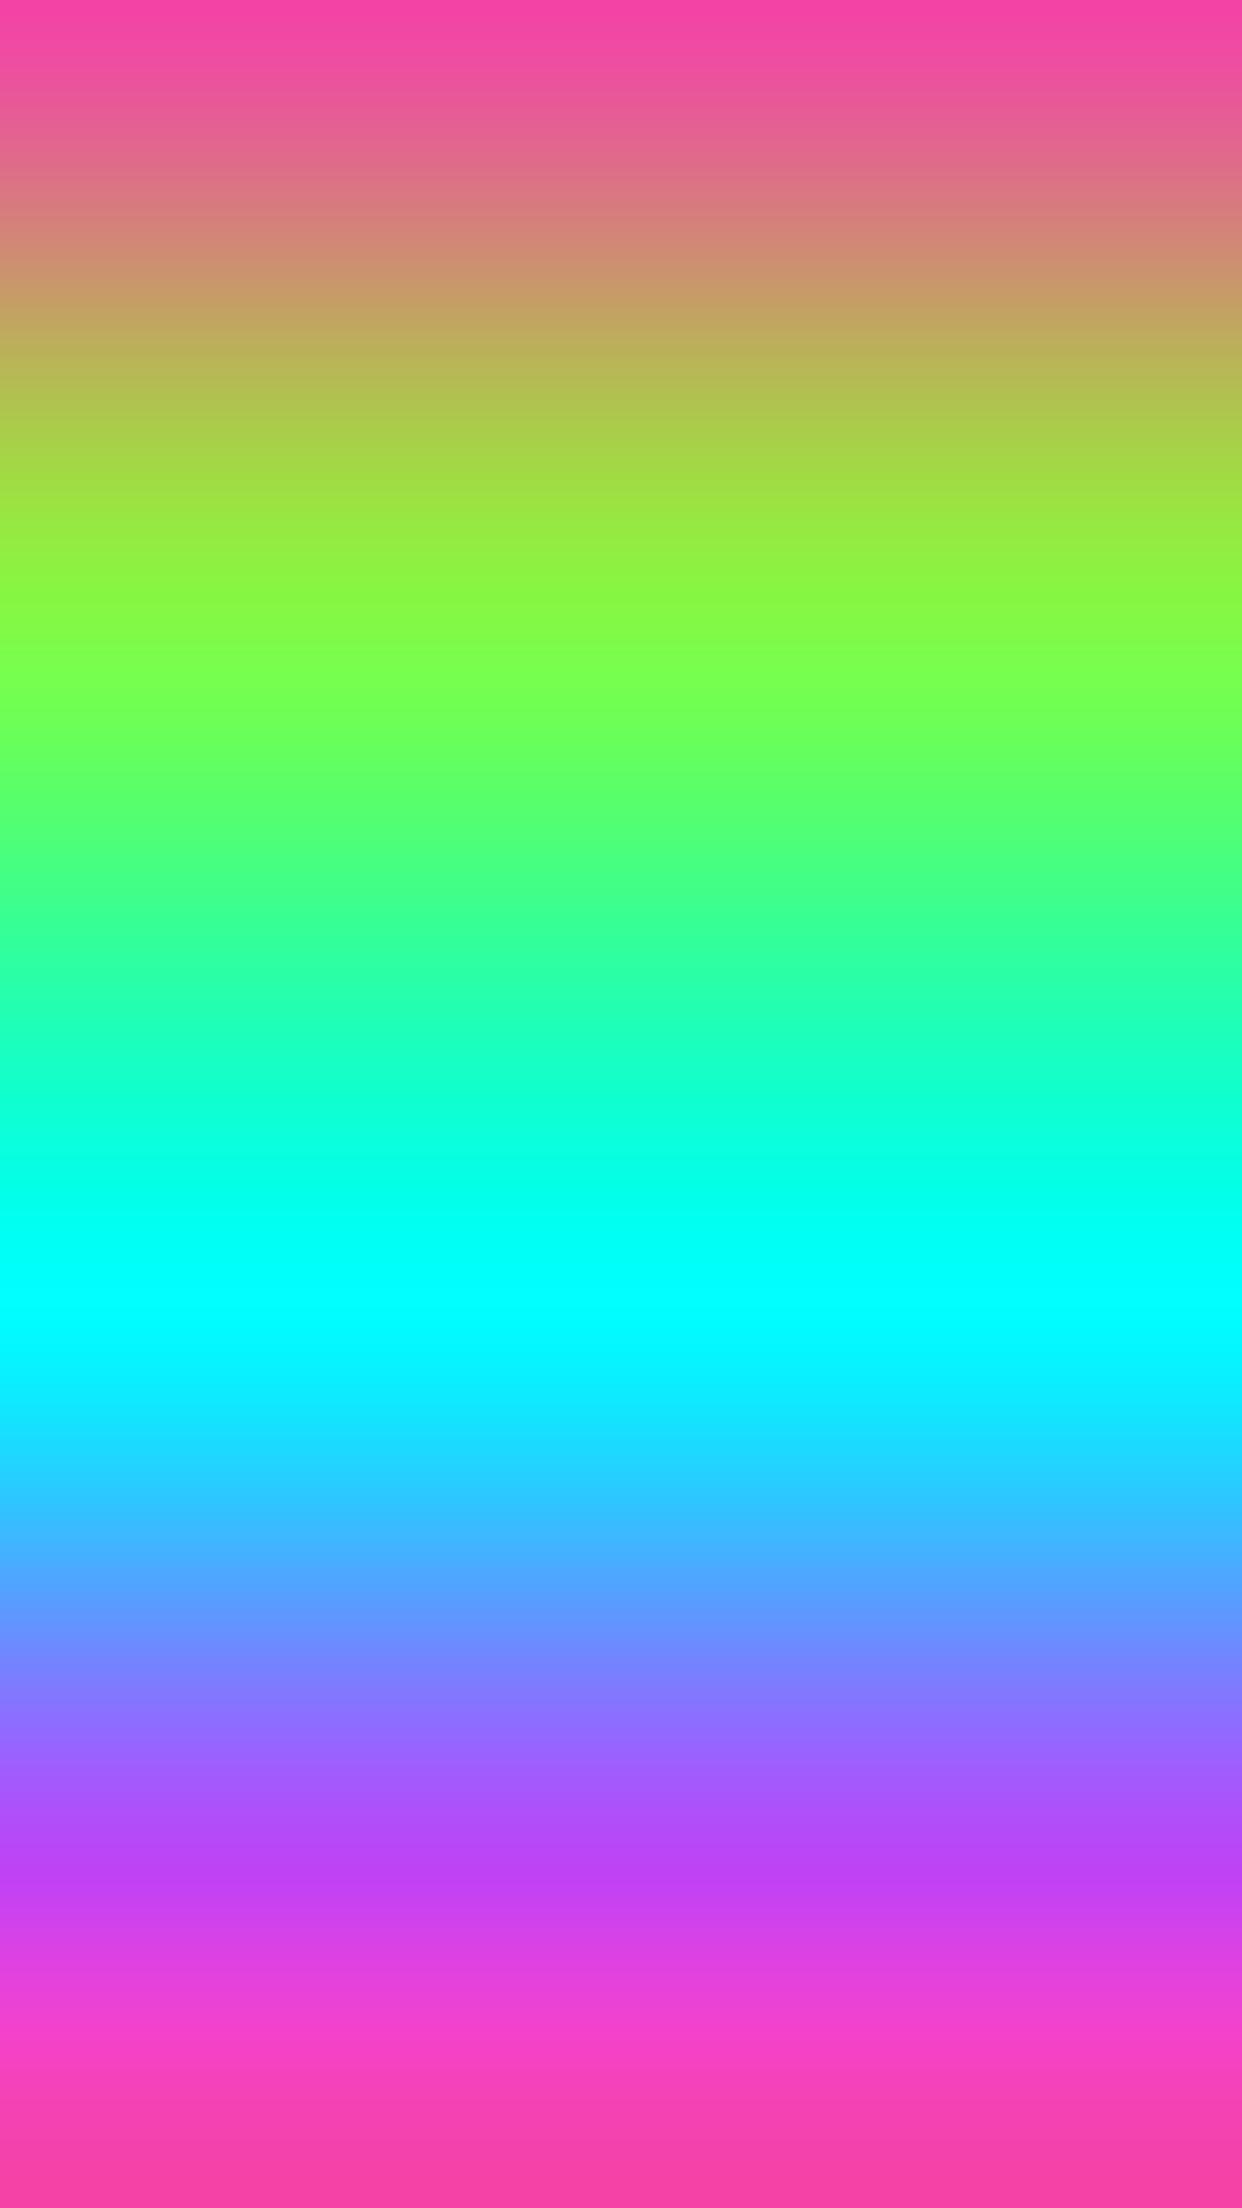 gradient ombre pink blue purple green wallpaper hd